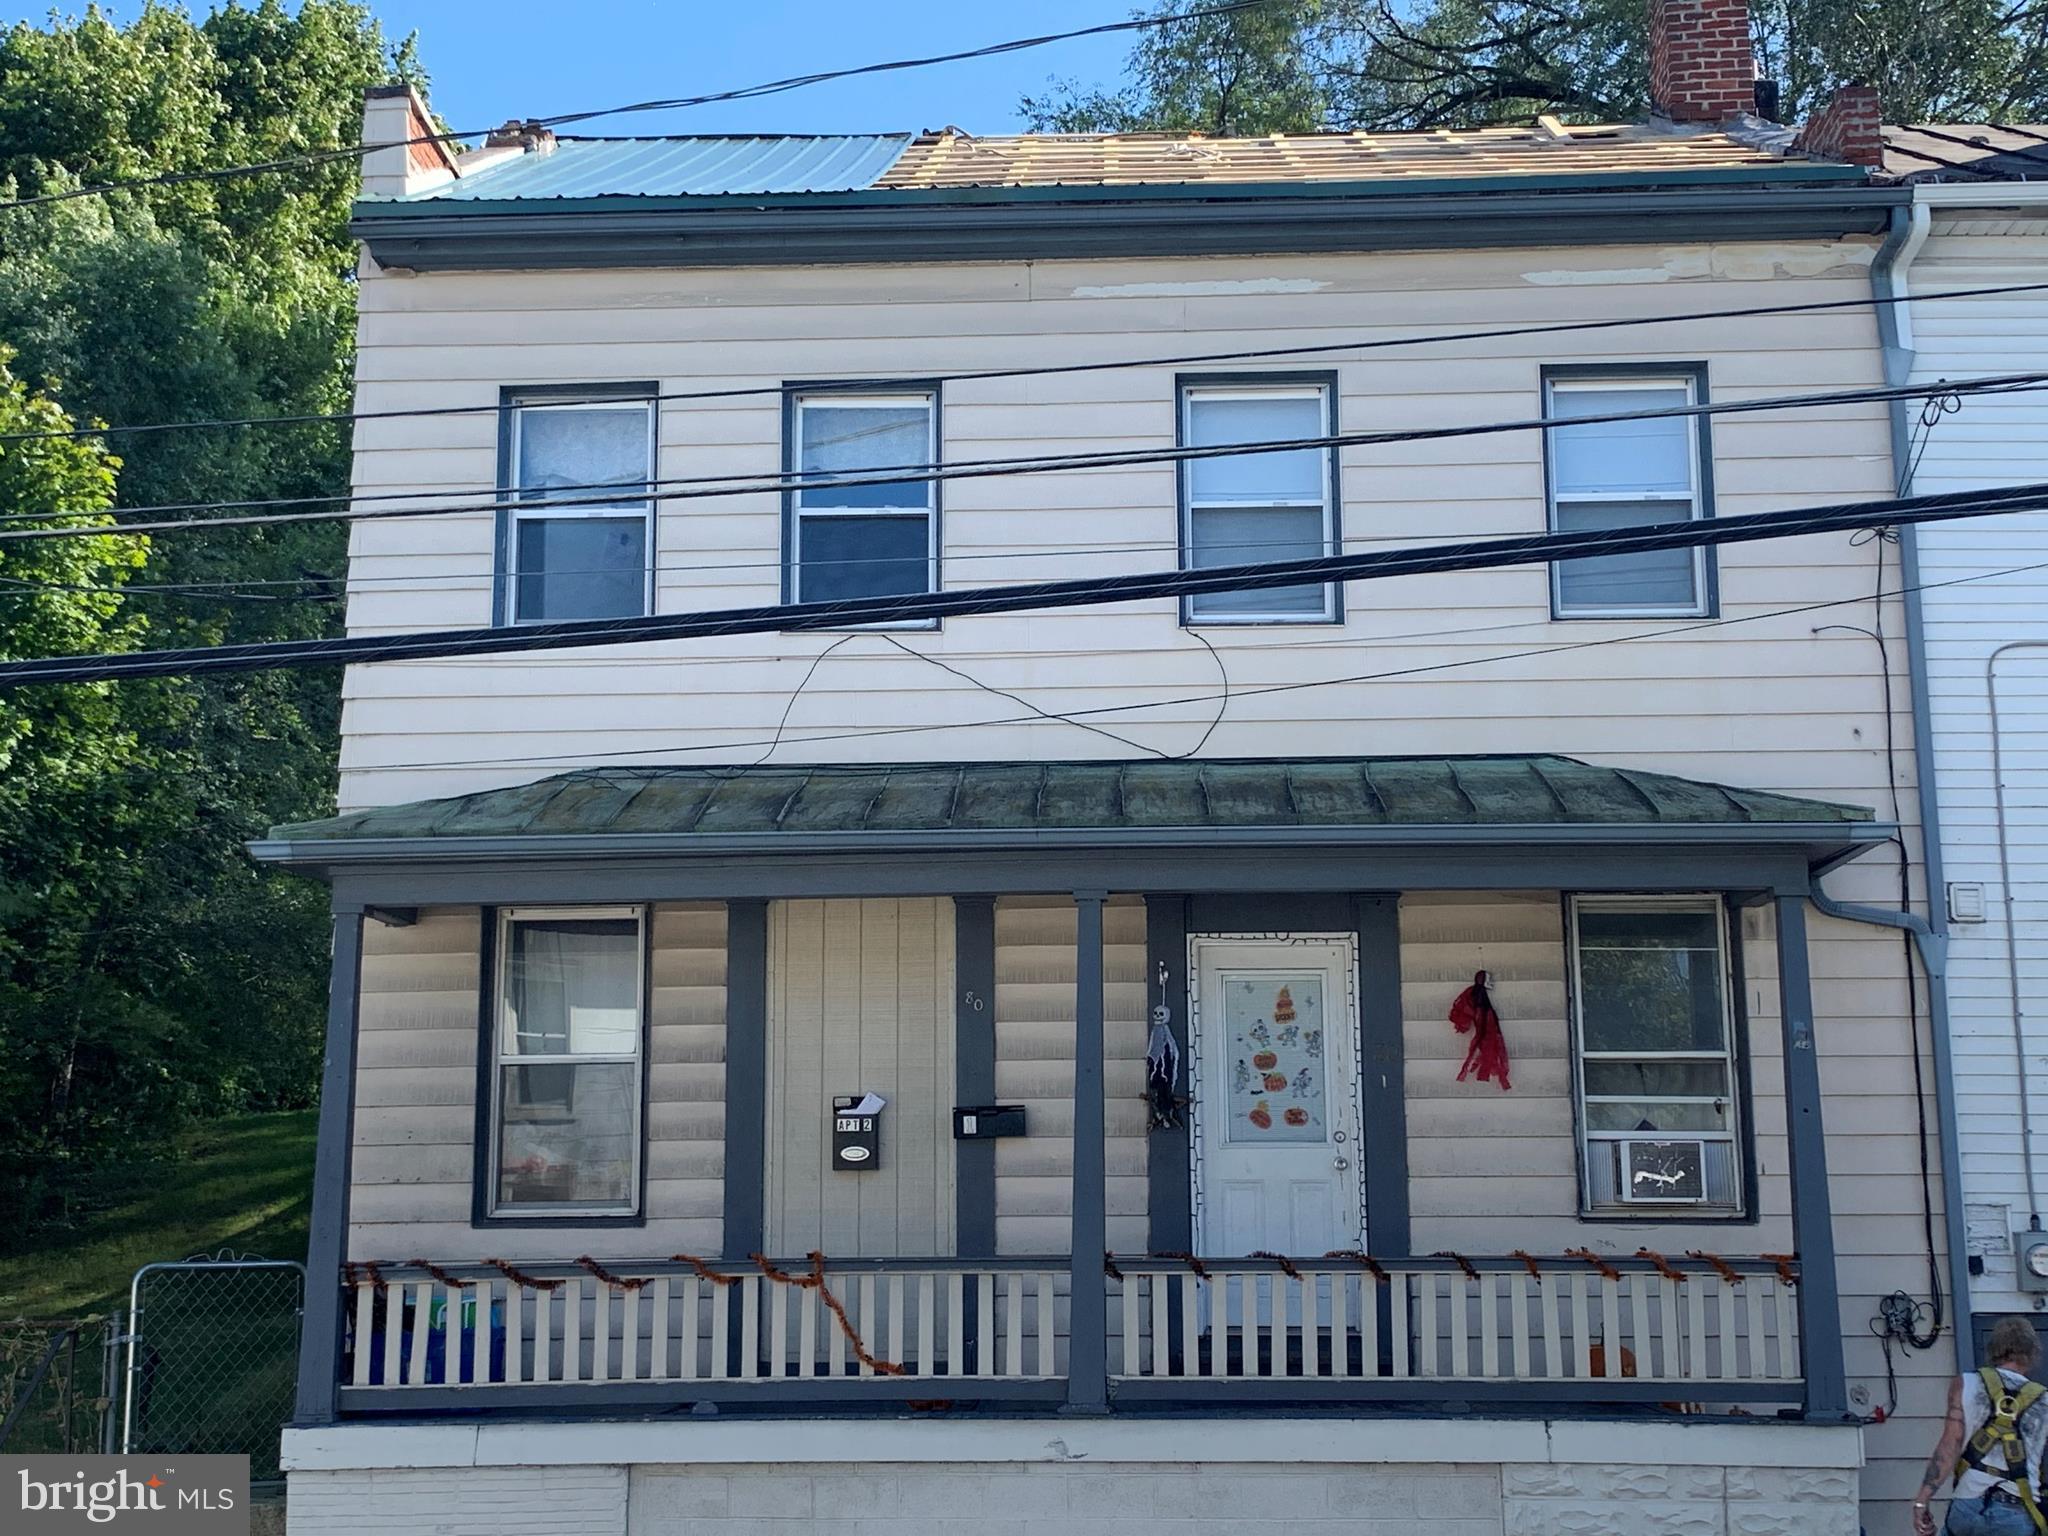 80 E MAIN STREET, NEWVILLE, PA 17241